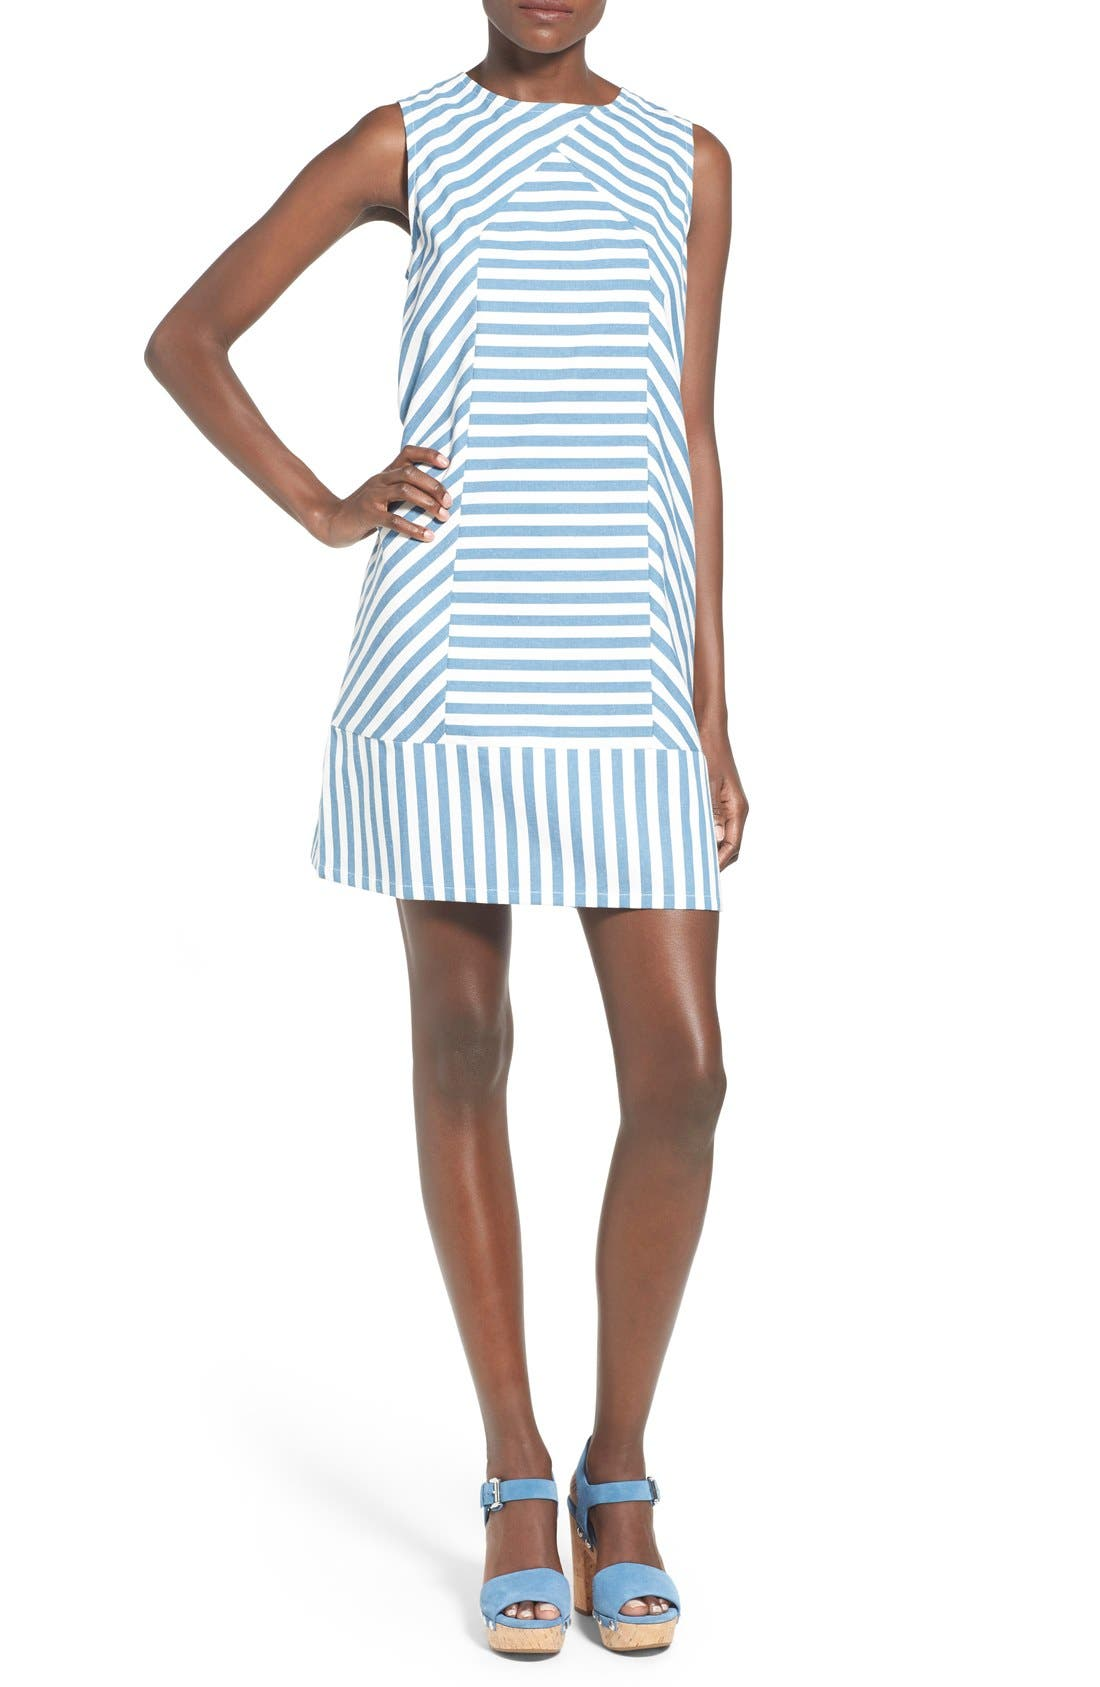 Alternate Image 1 Selected - Rachel Antonoff 'Sam' Stripe Cotton Shift Dress